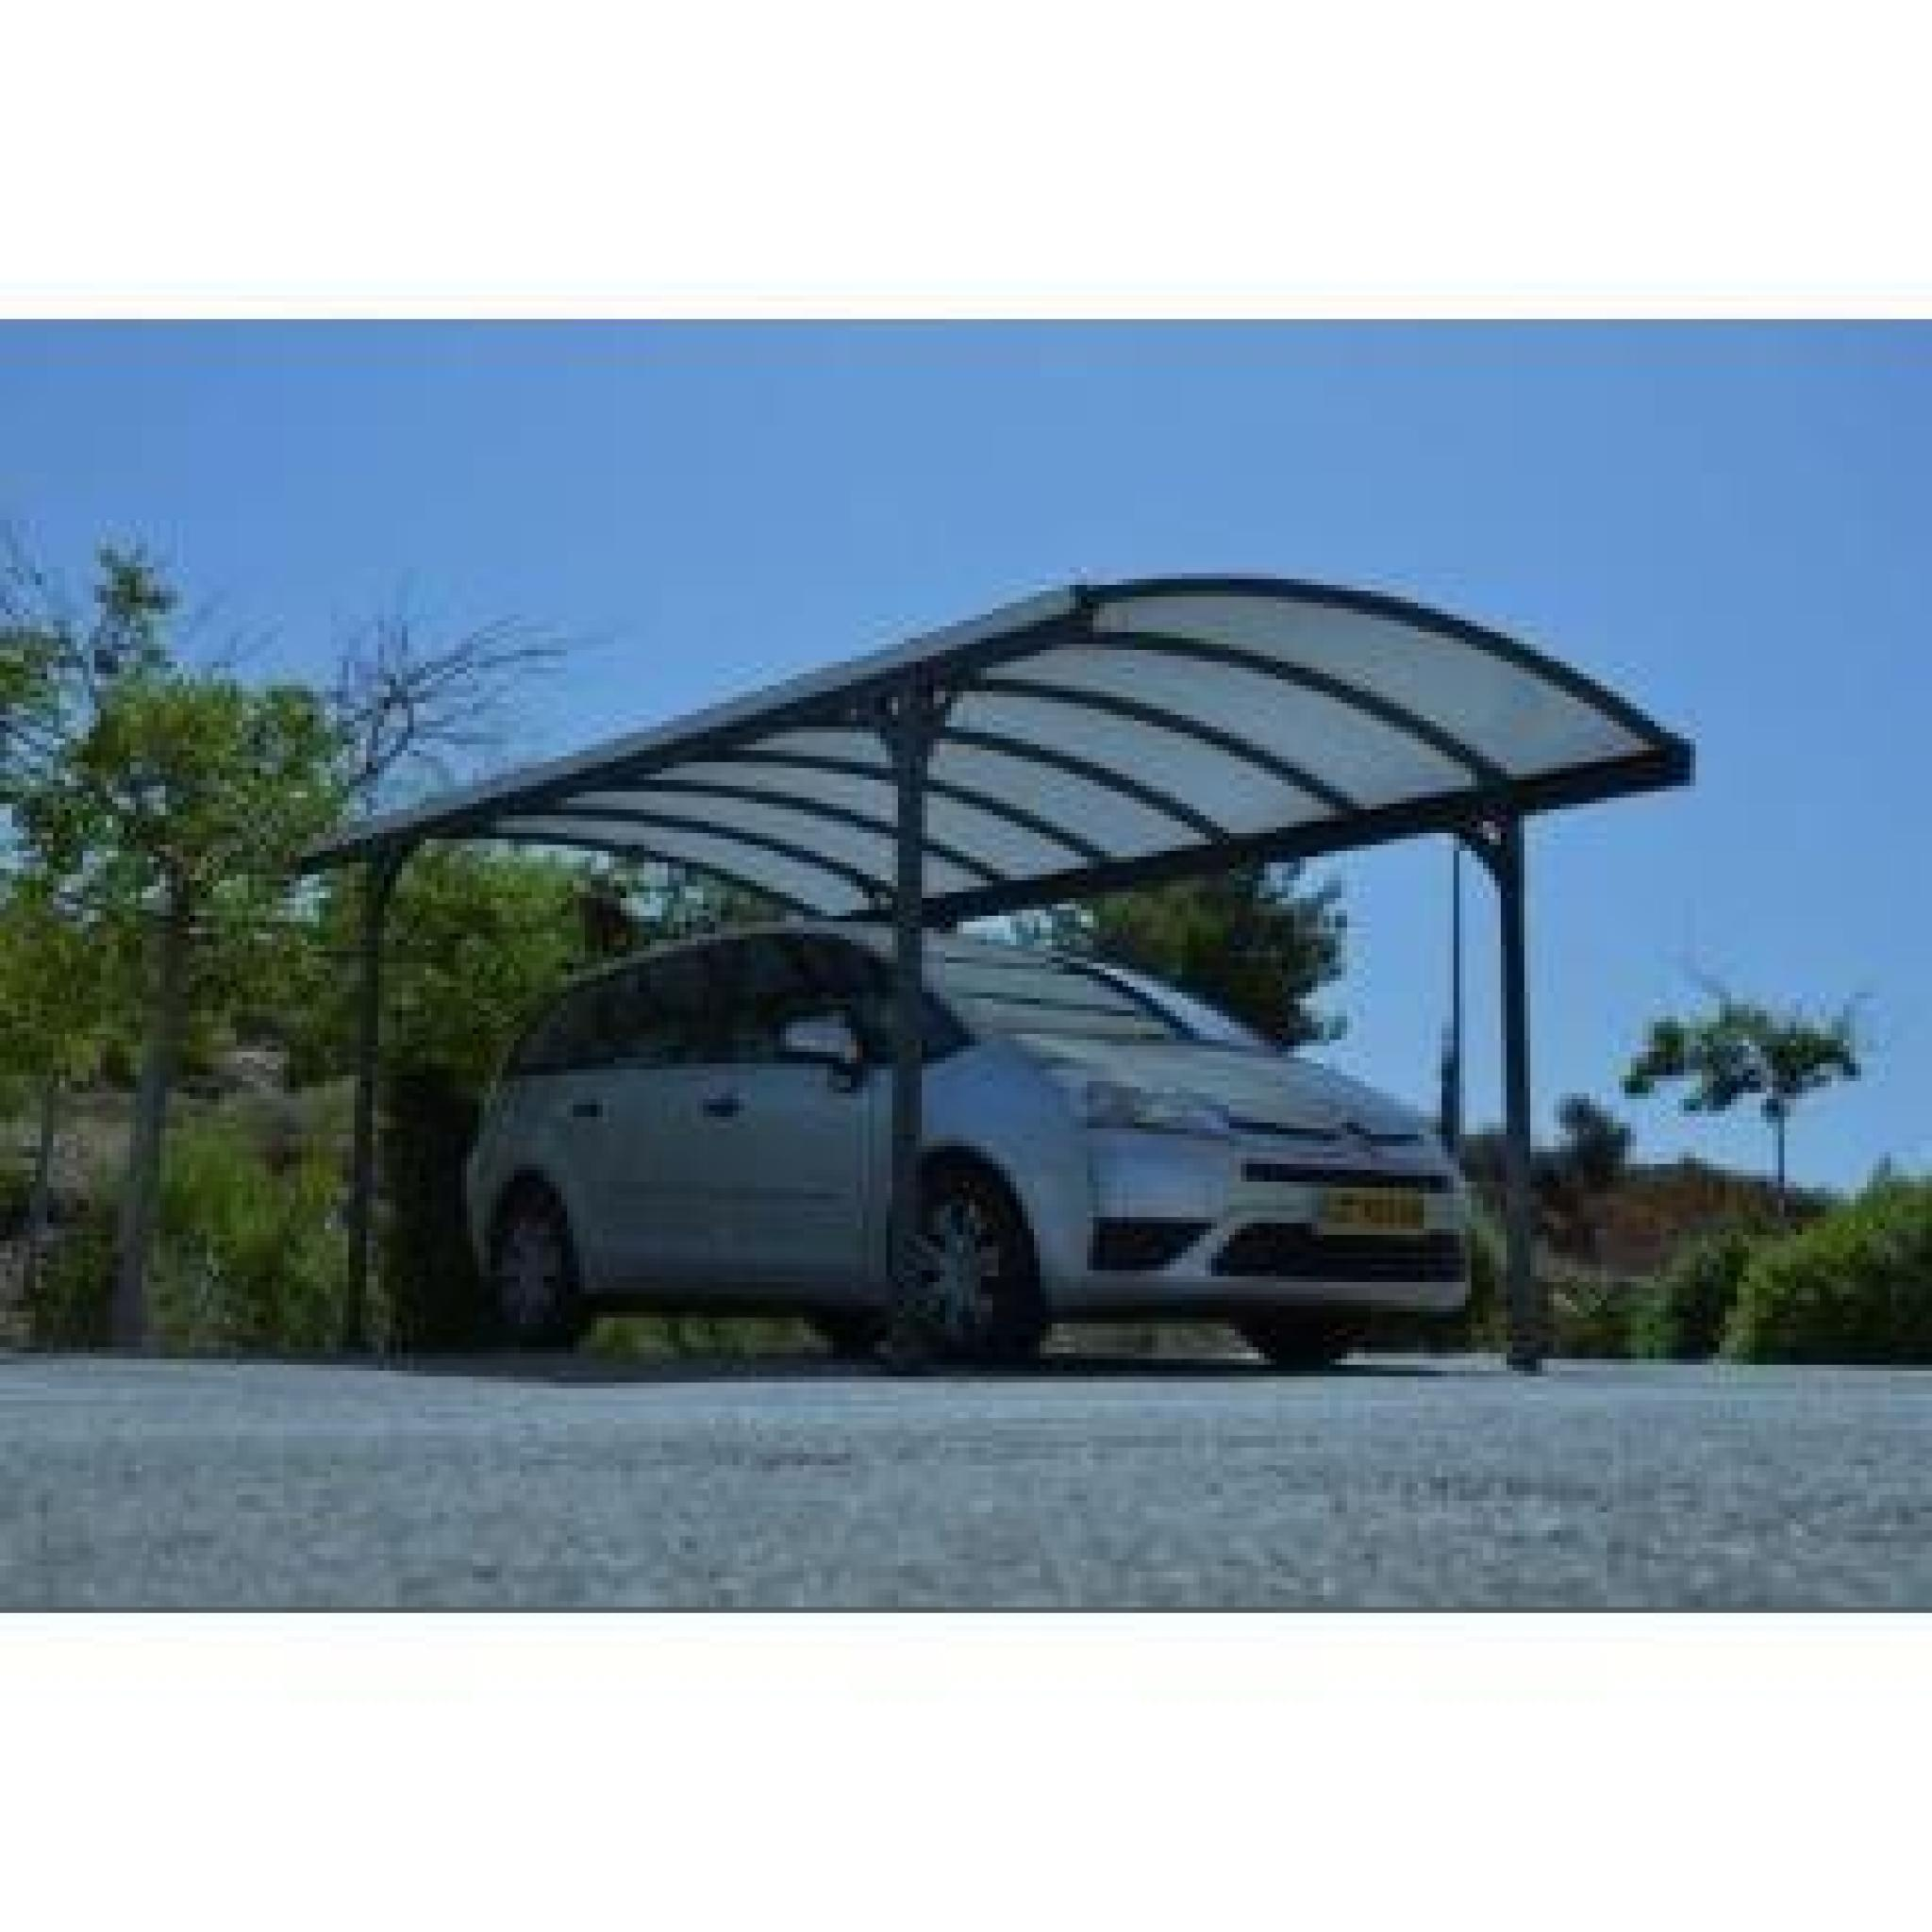 Carport delage gris m tal achat vente carport en aluminium pas cher coind - Carport aluminium pas cher ...